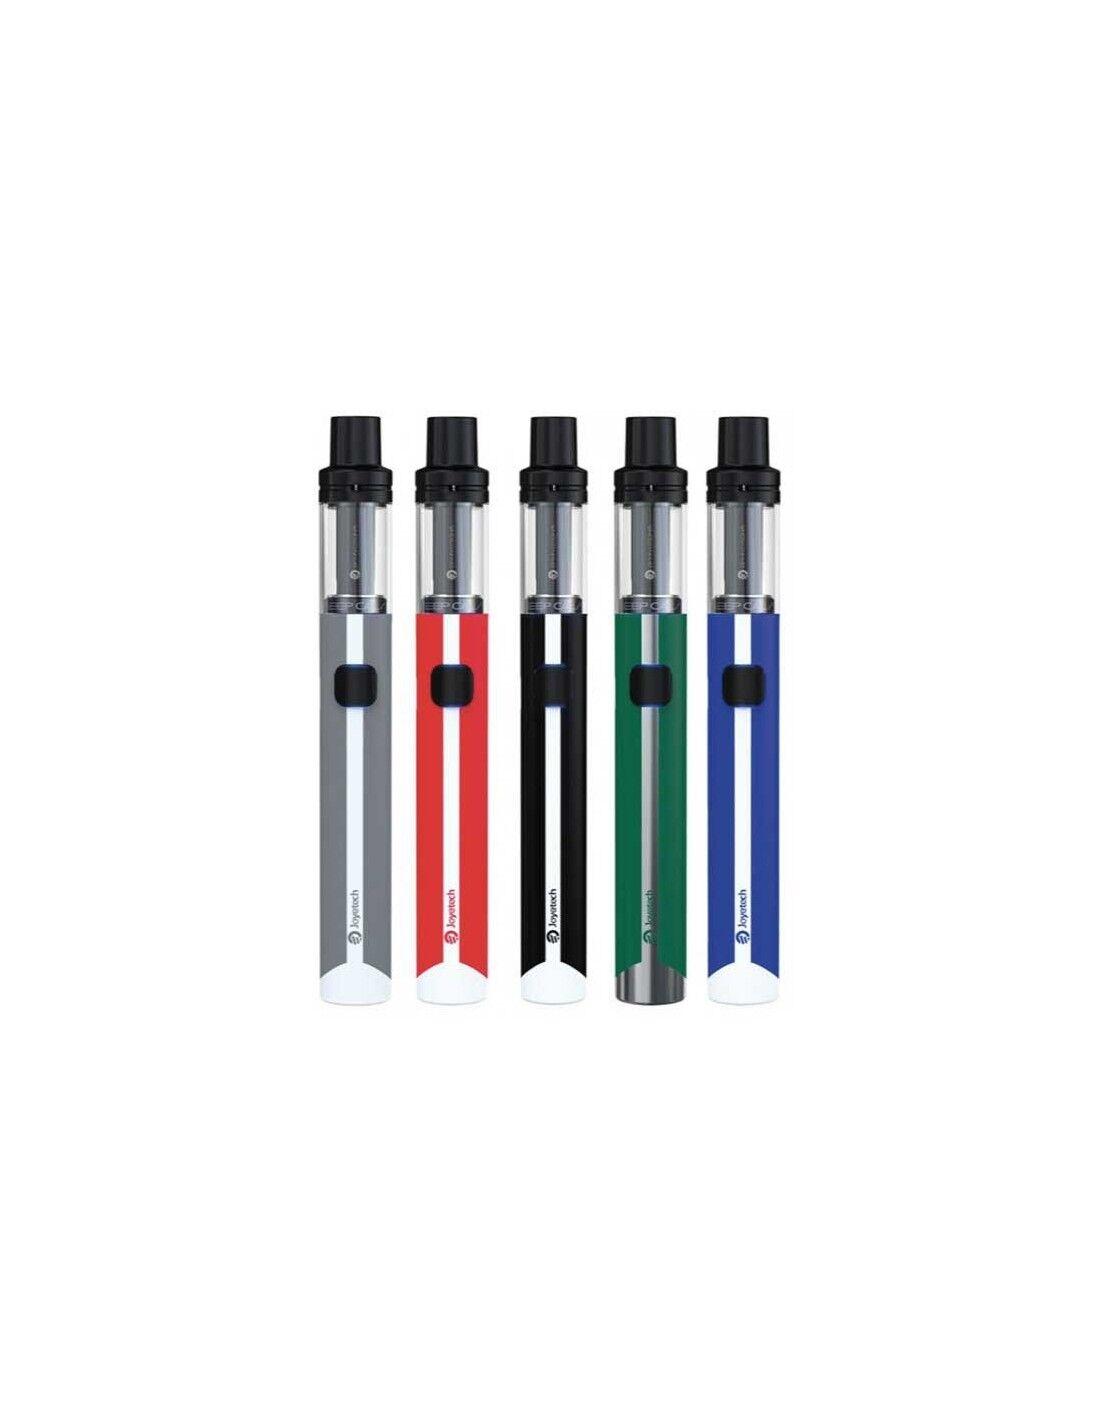 Joyetech Ego Aio Eco Starter Kit Sigaretta Elettronica Con Batteria Integrata Da 650mah